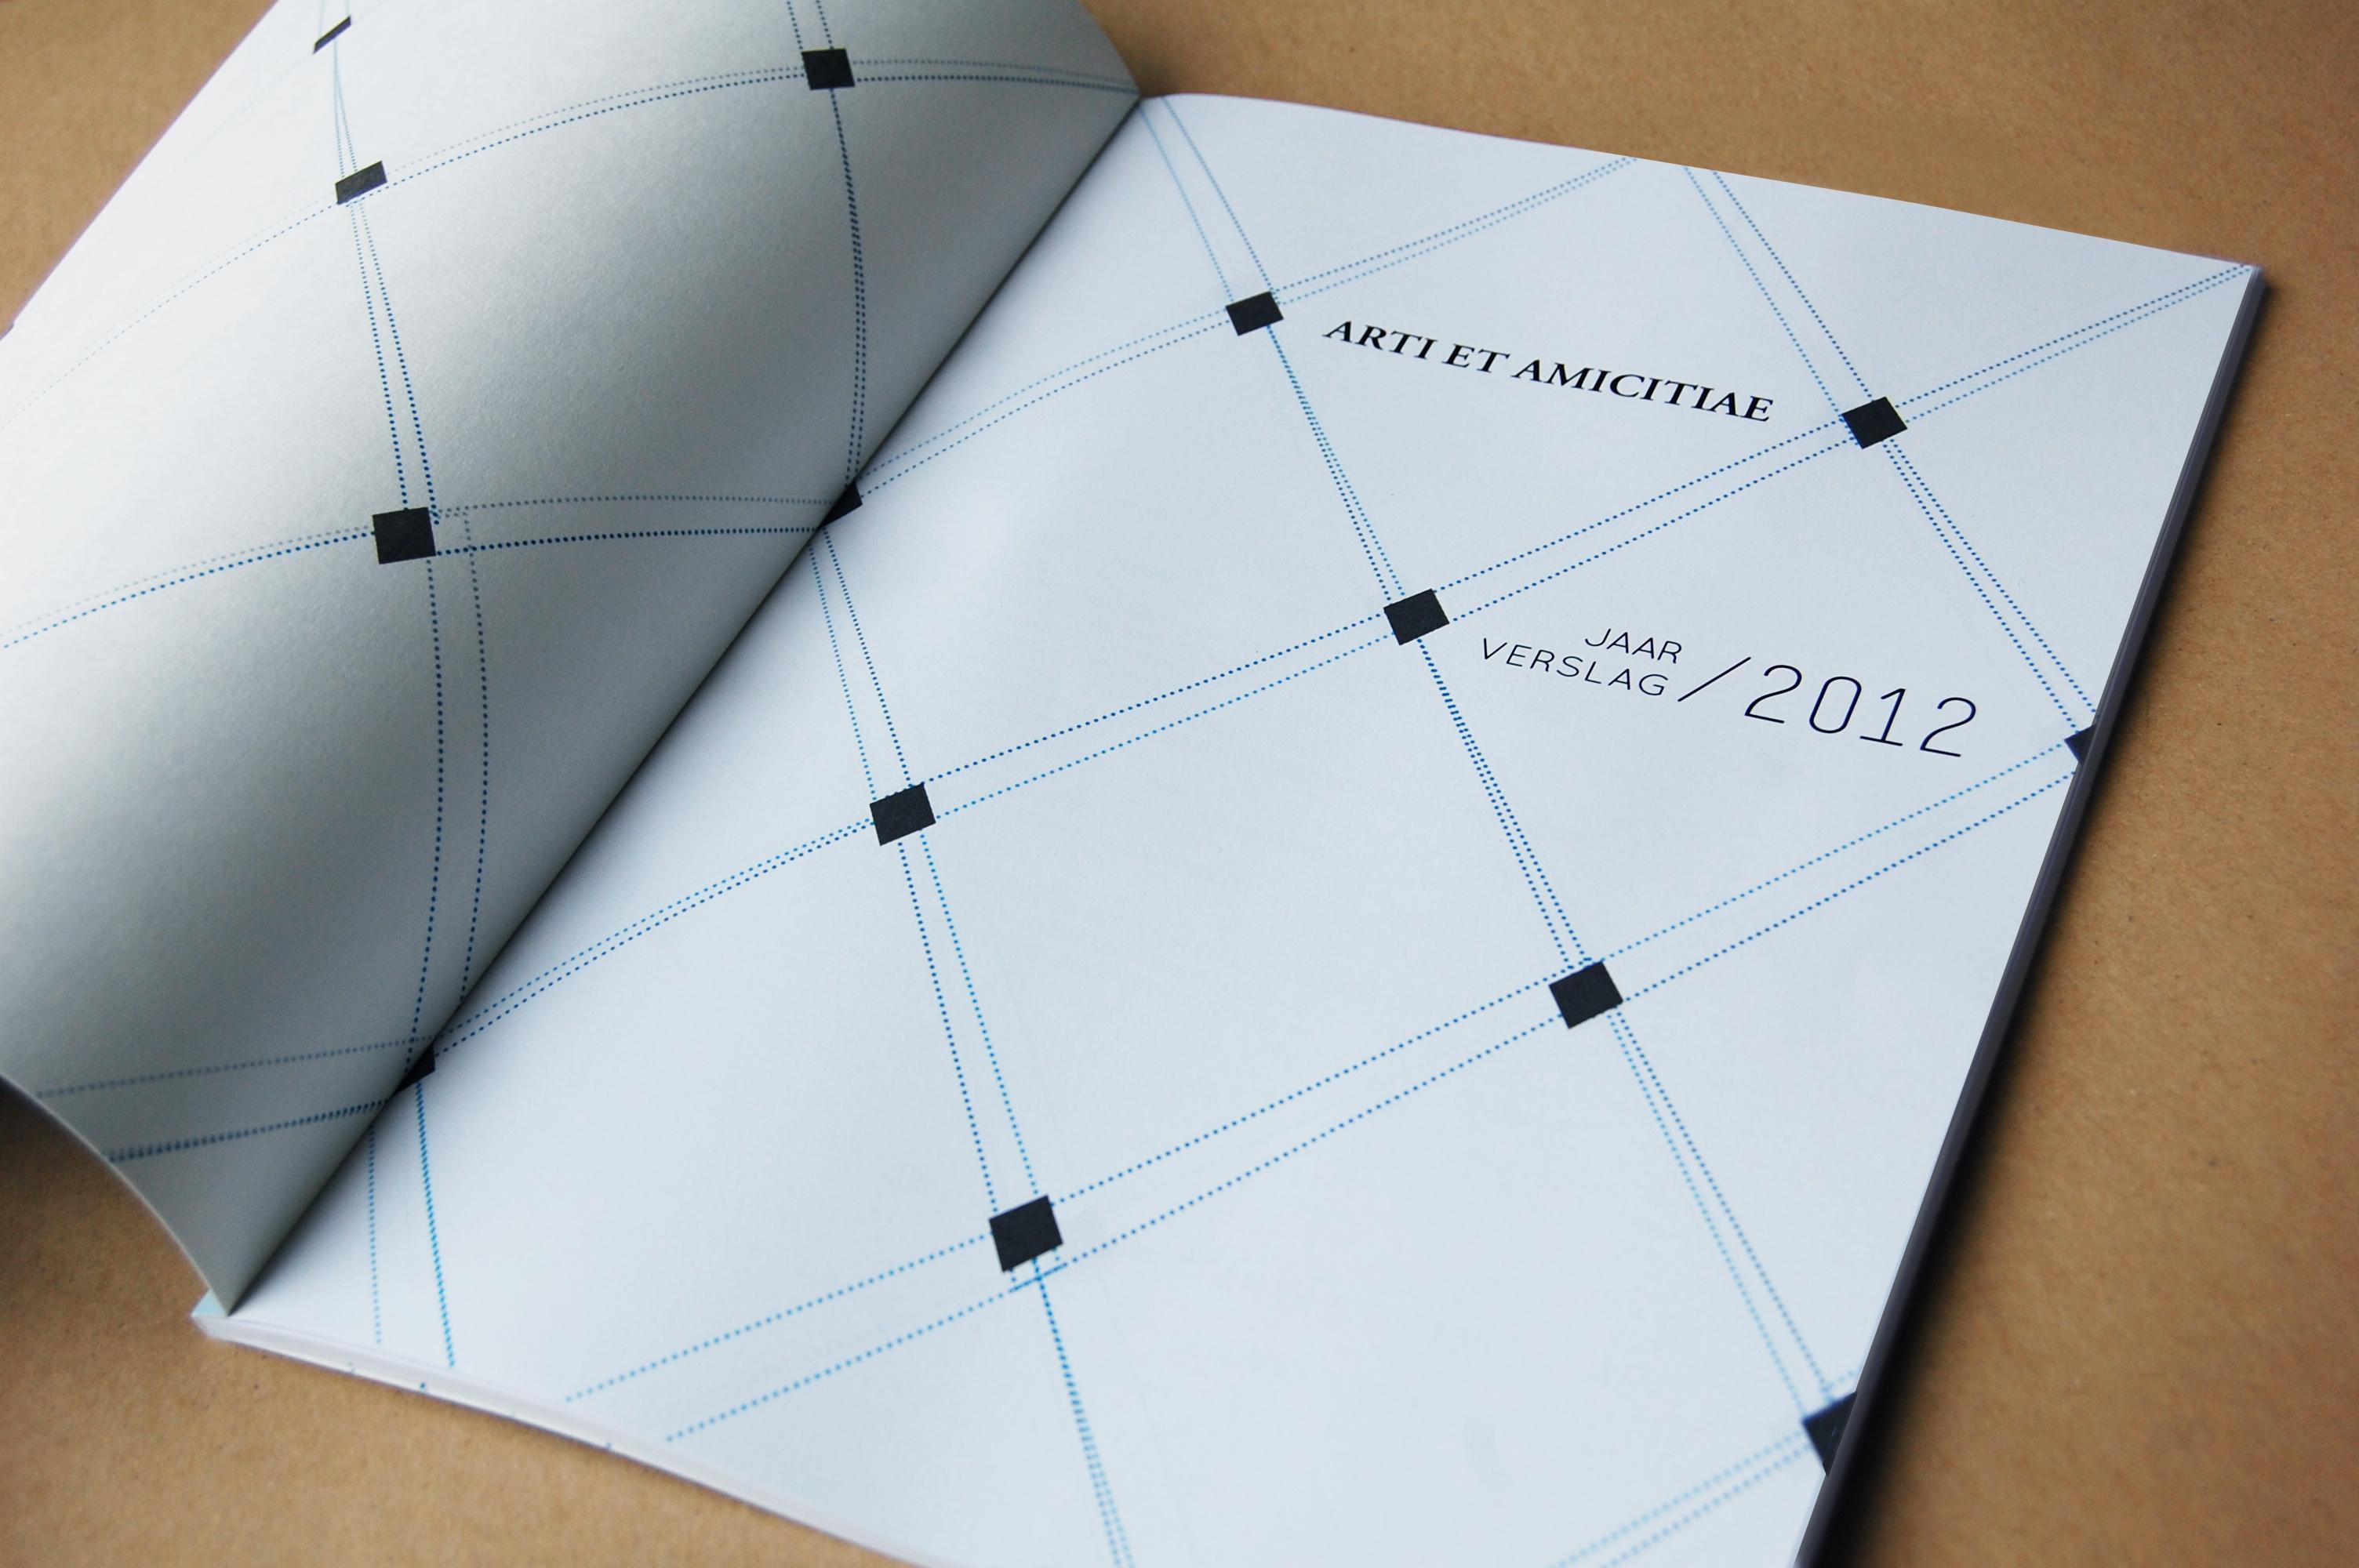 arti et amicitiae jaarverslag grafisch ontwerp studio buro auke wieringa